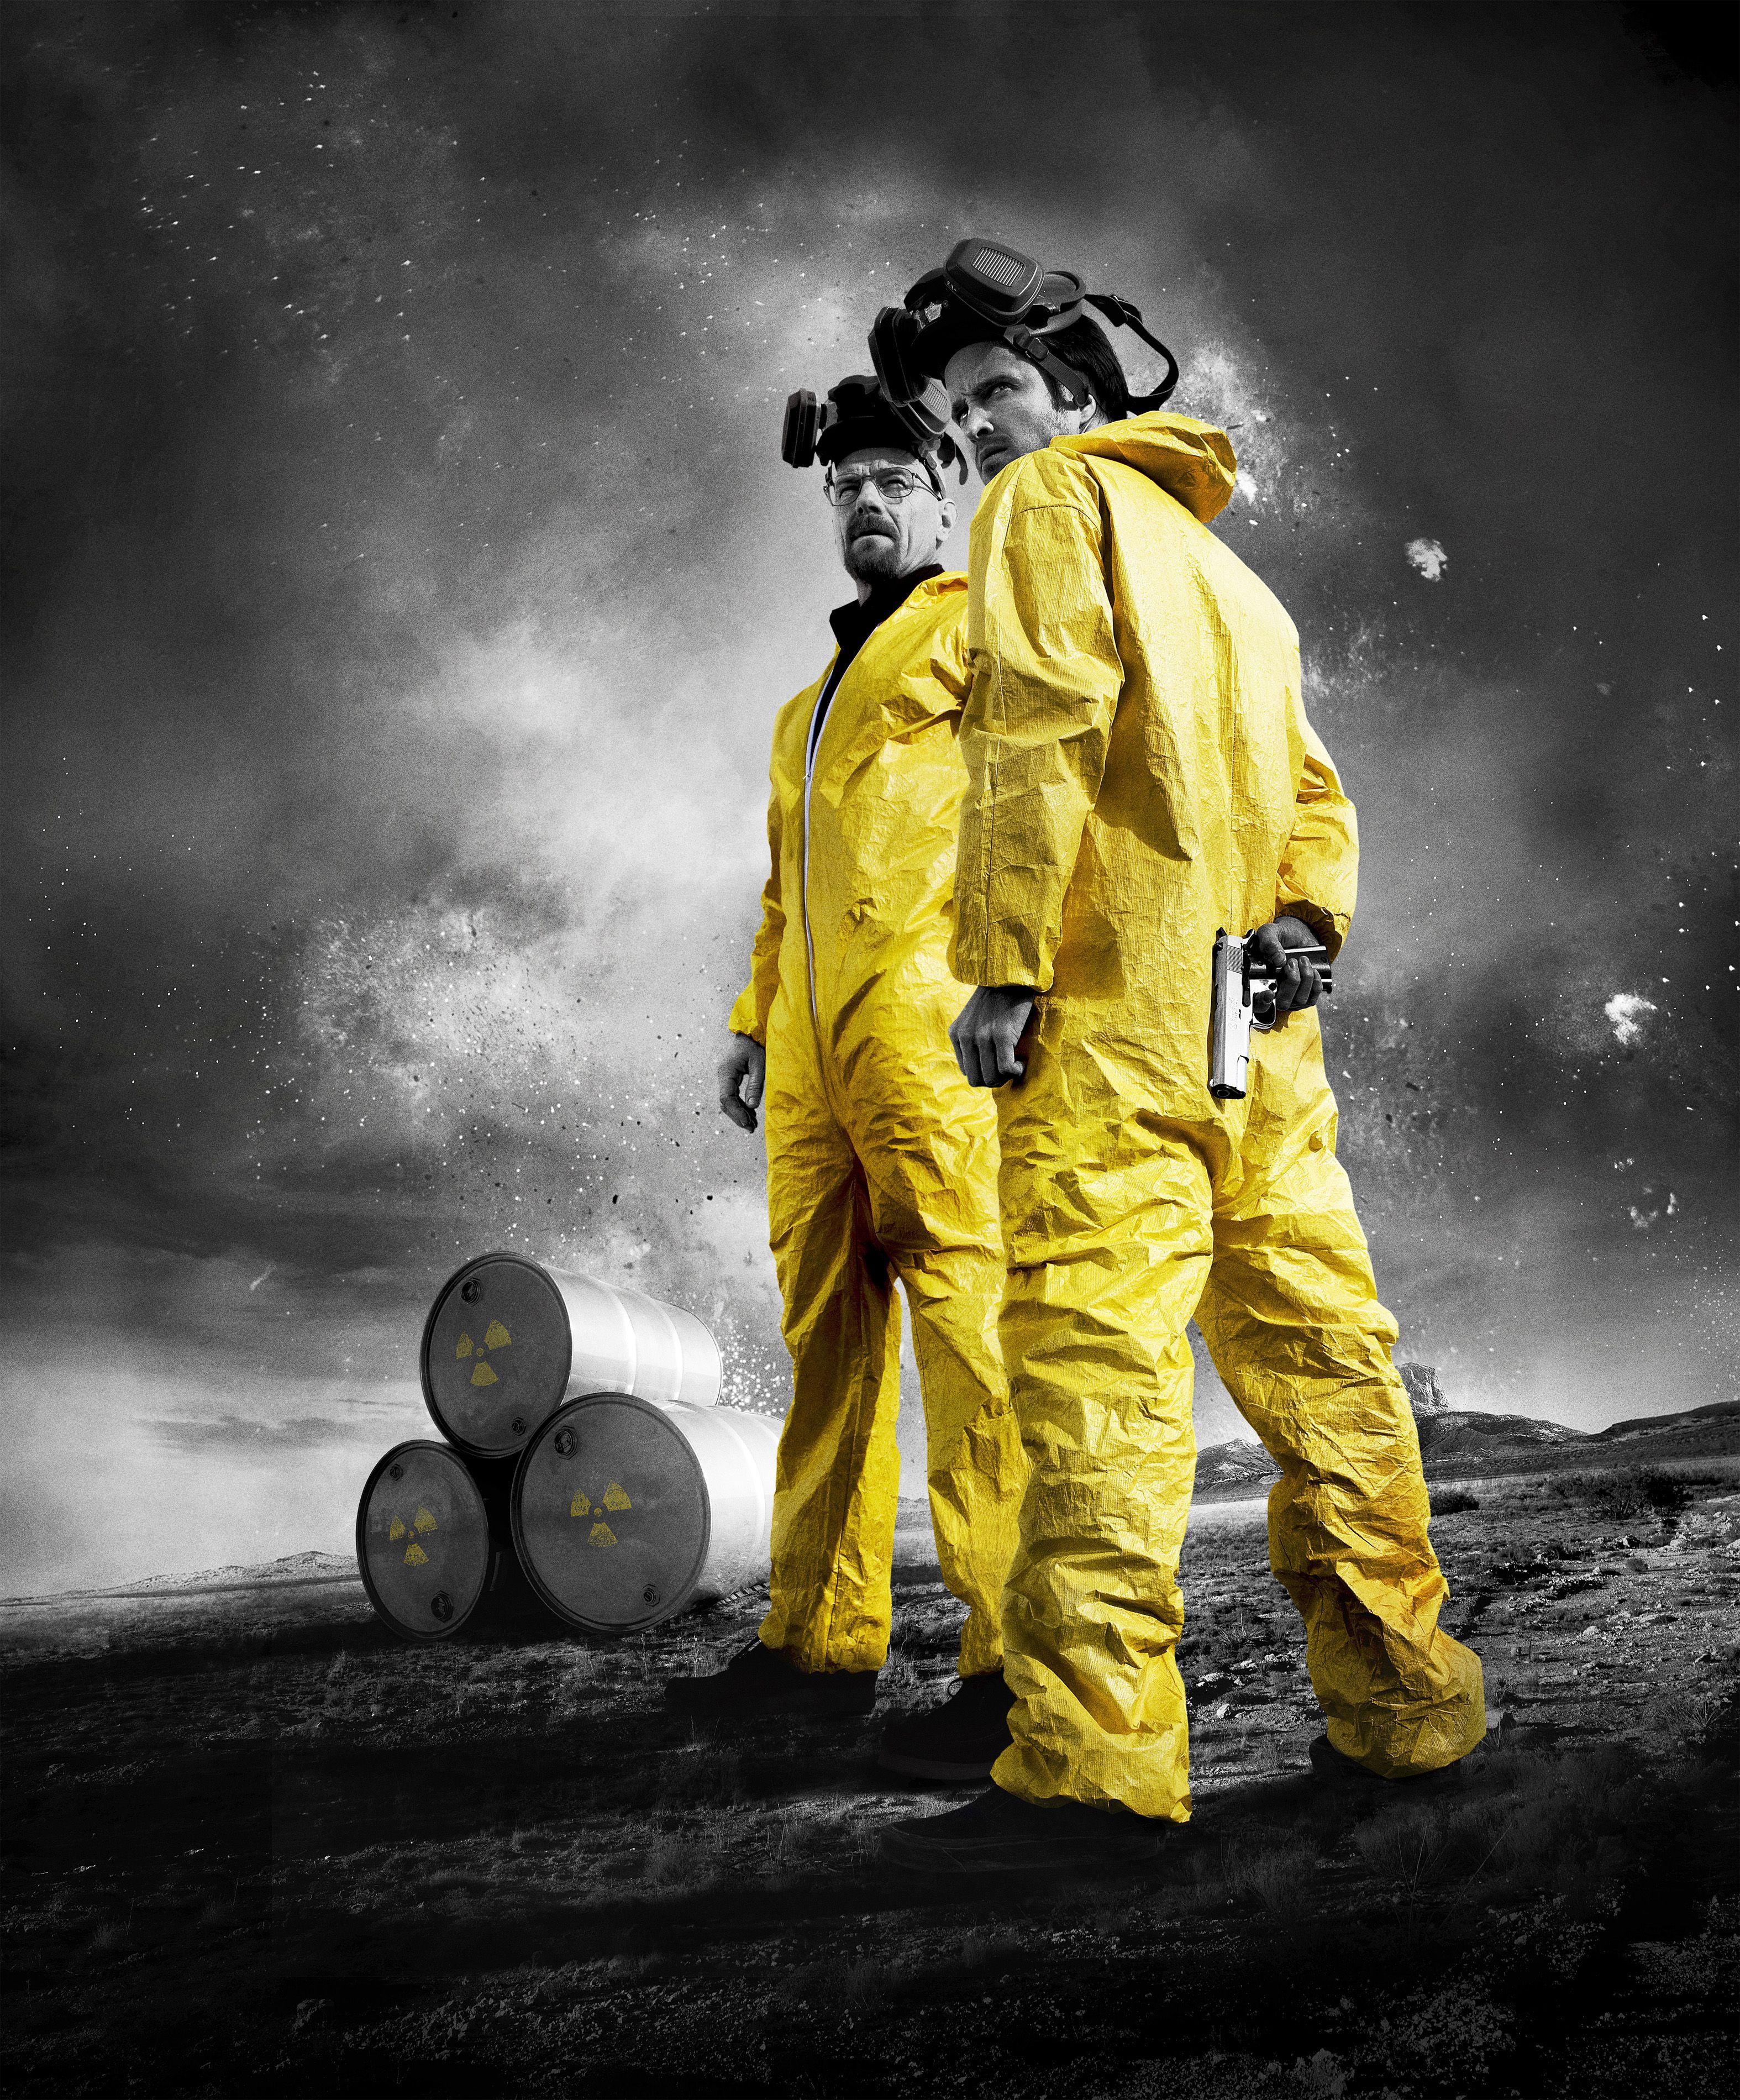 Breaking Bad Season 3 - Walter White - Breaking Bad Photo ... |Walter White Season 3